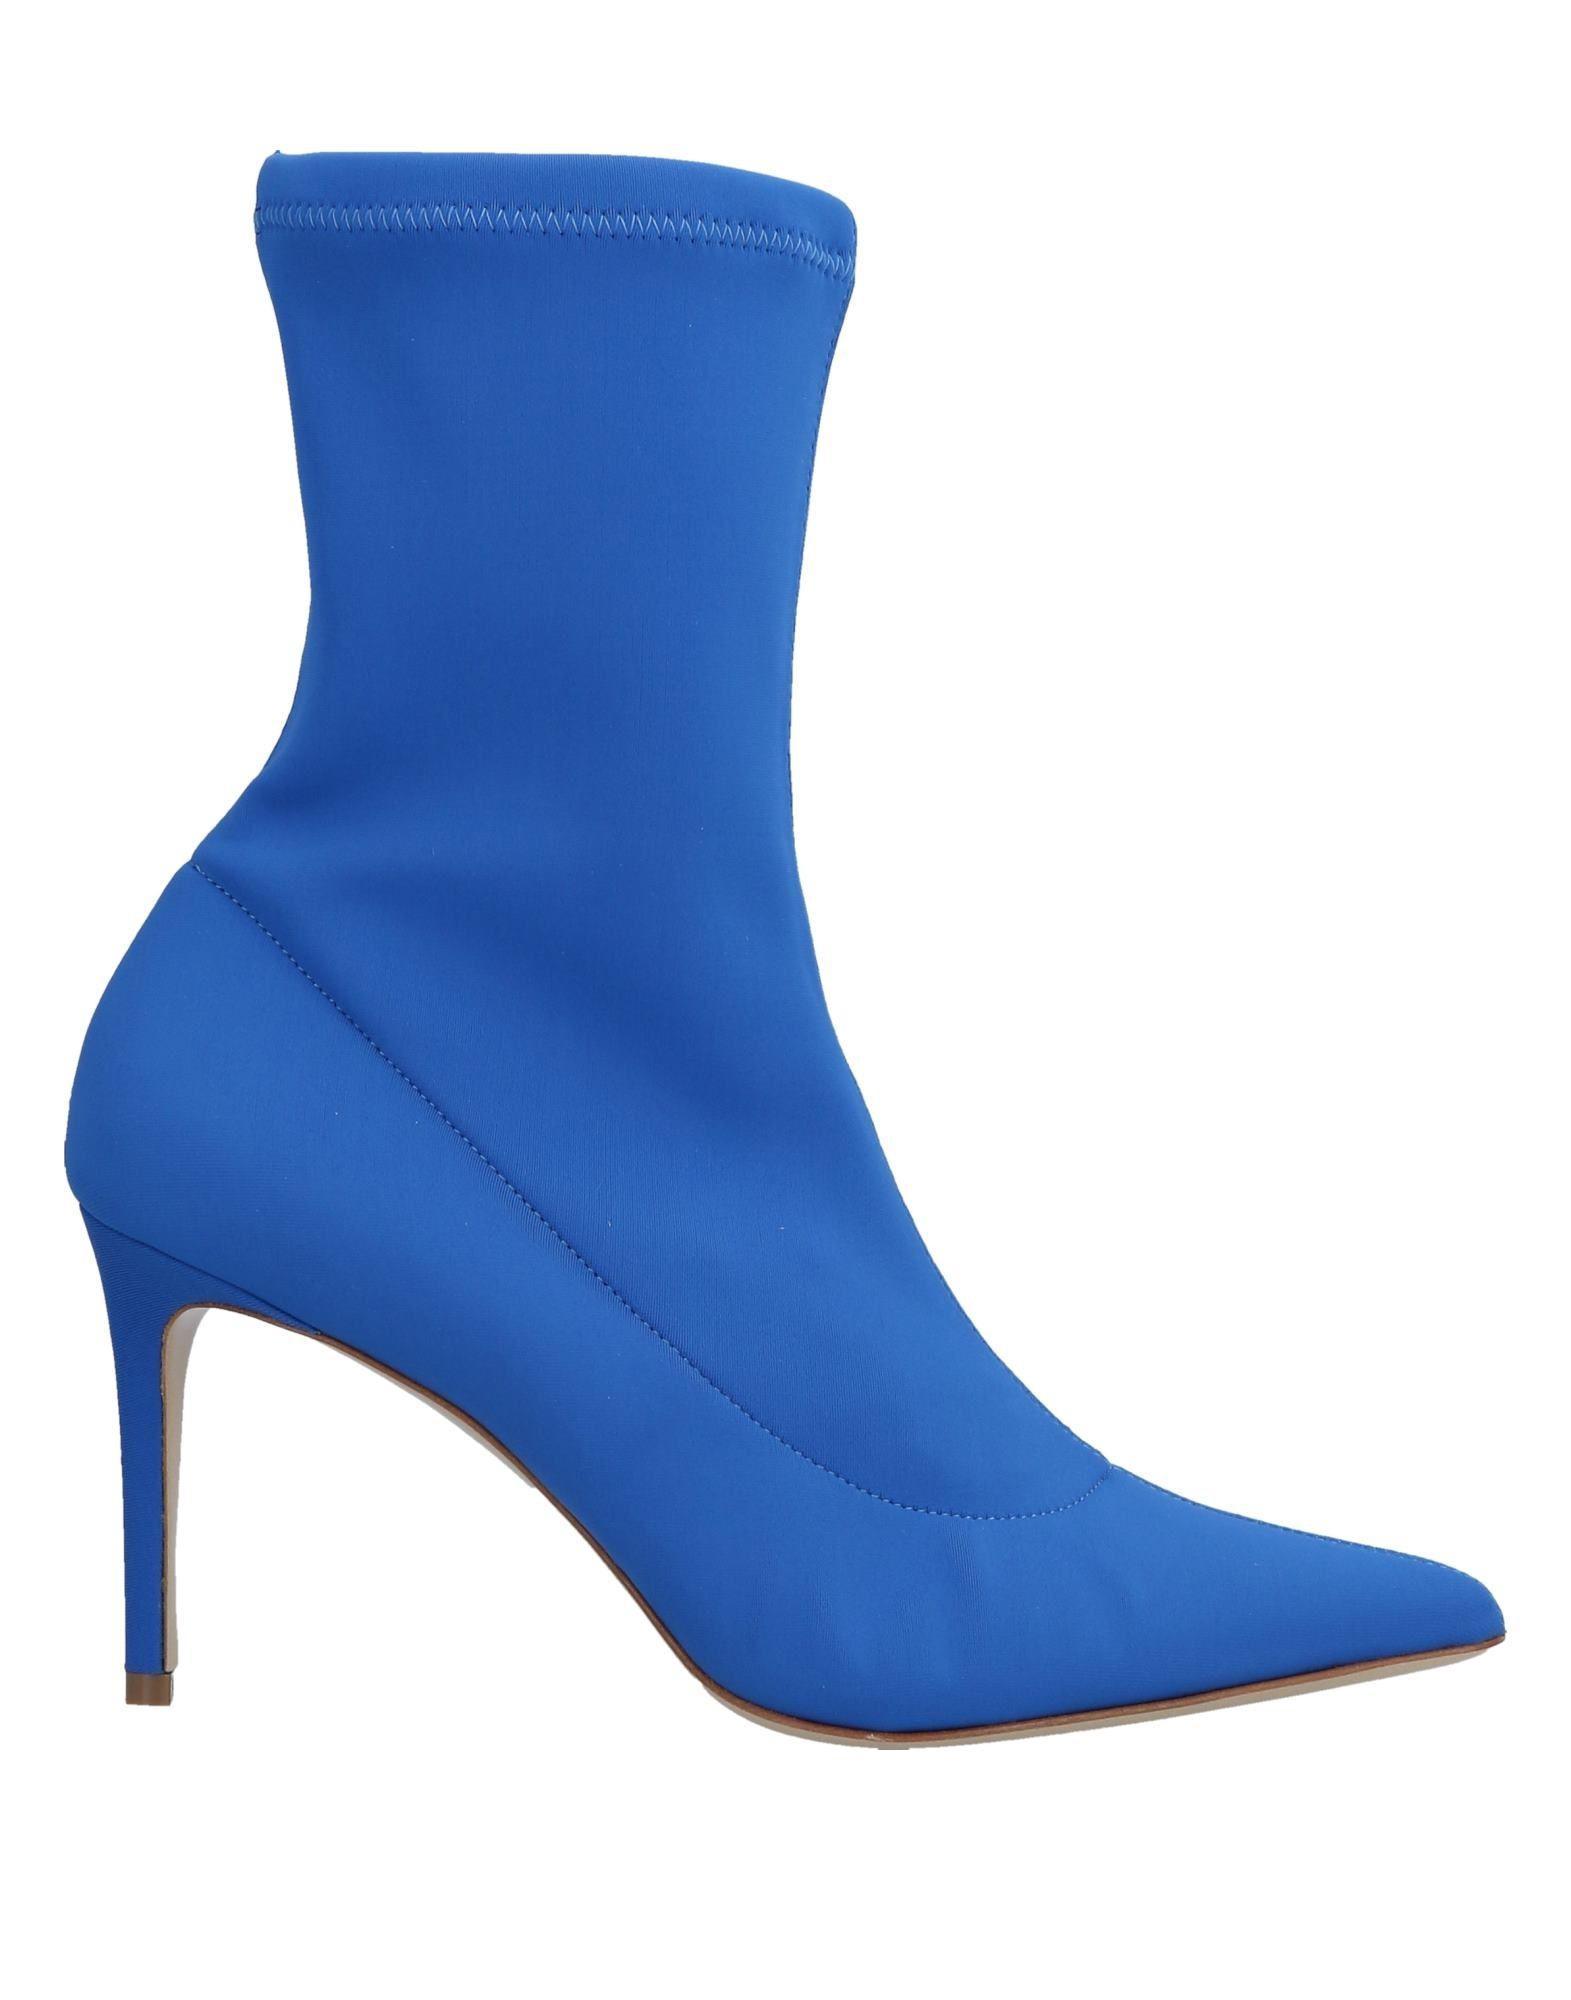 73b3b6af1f98 Lyst - Aldo Castagna Ankle Boots in Blue